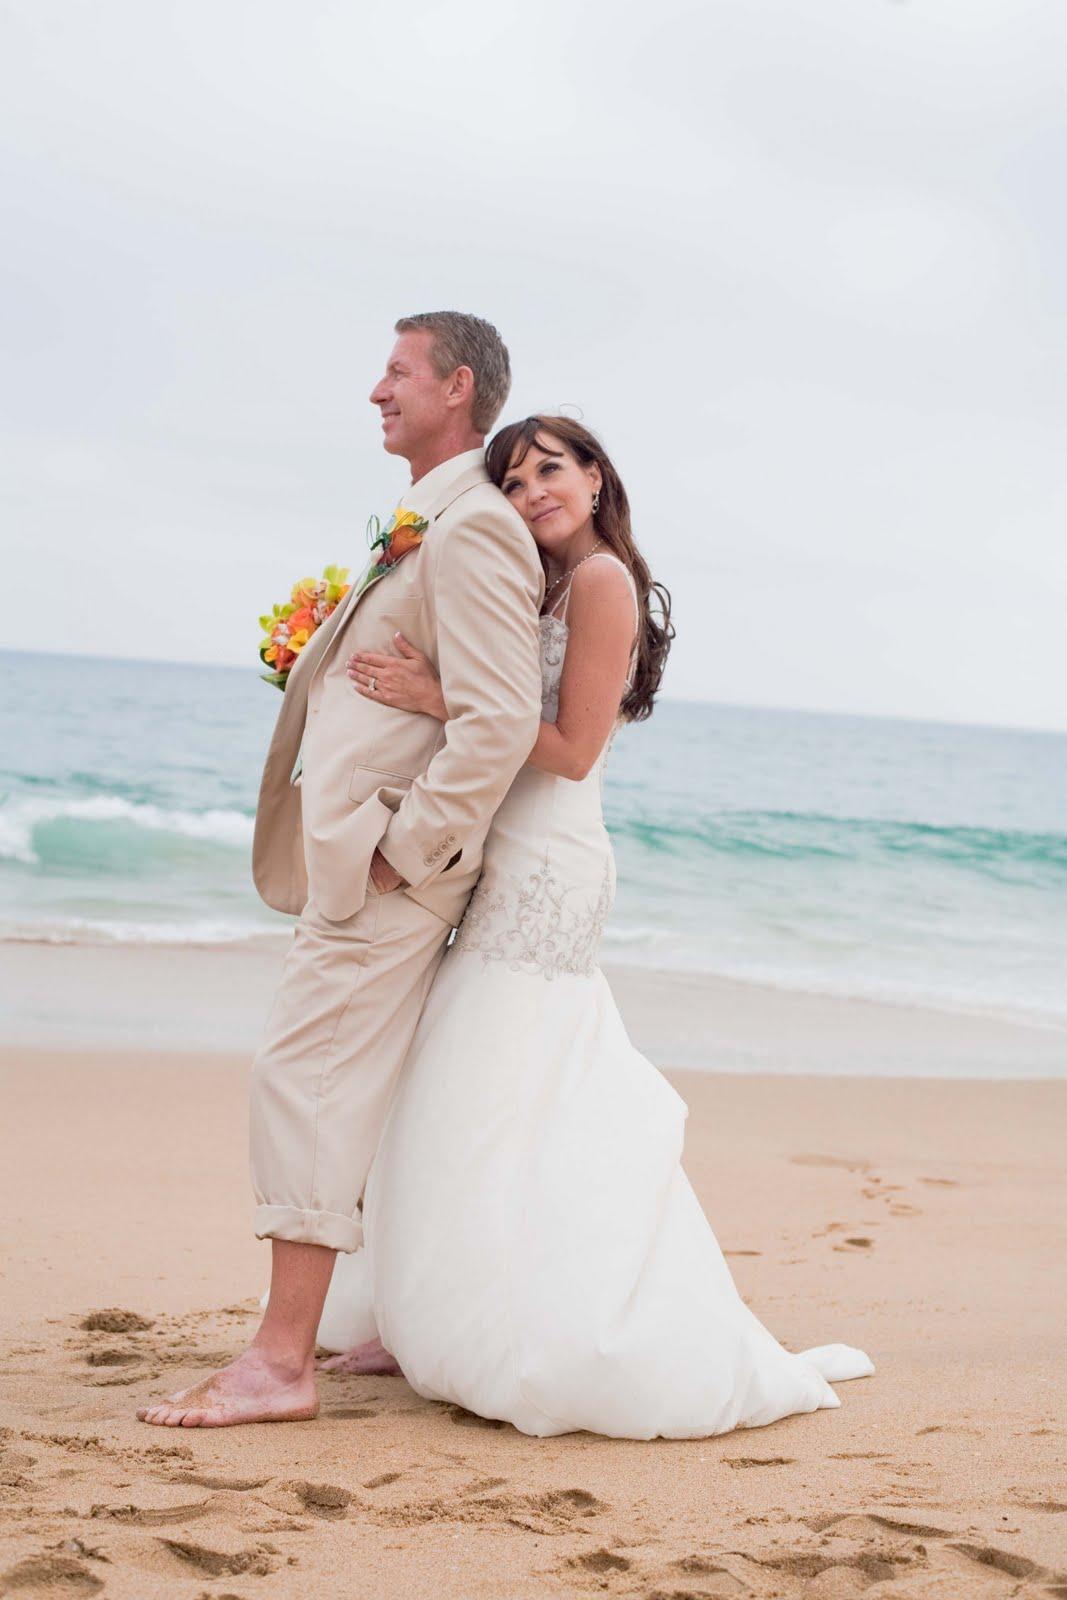 Lucia Photography Blog 951-552-0694: Balboa Peninsula